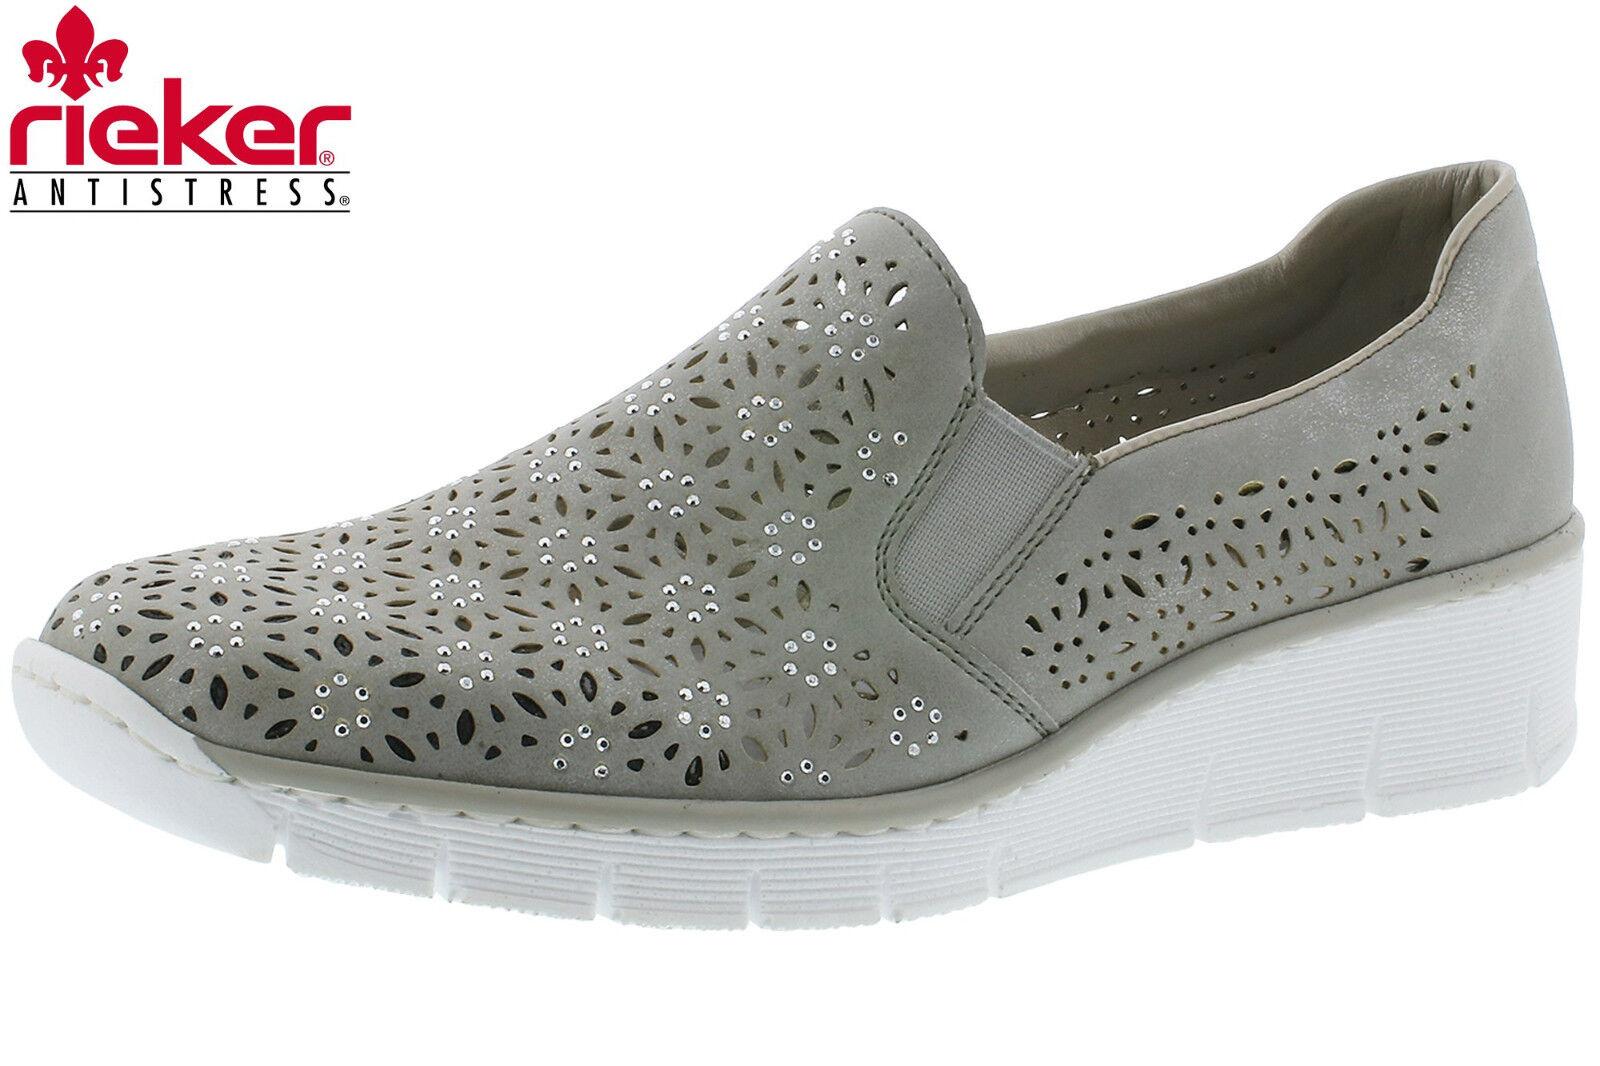 Rieker Damen Slipper Beige Grau Metallic Strass Sommer Halbschuhe 537L7-40 NEU